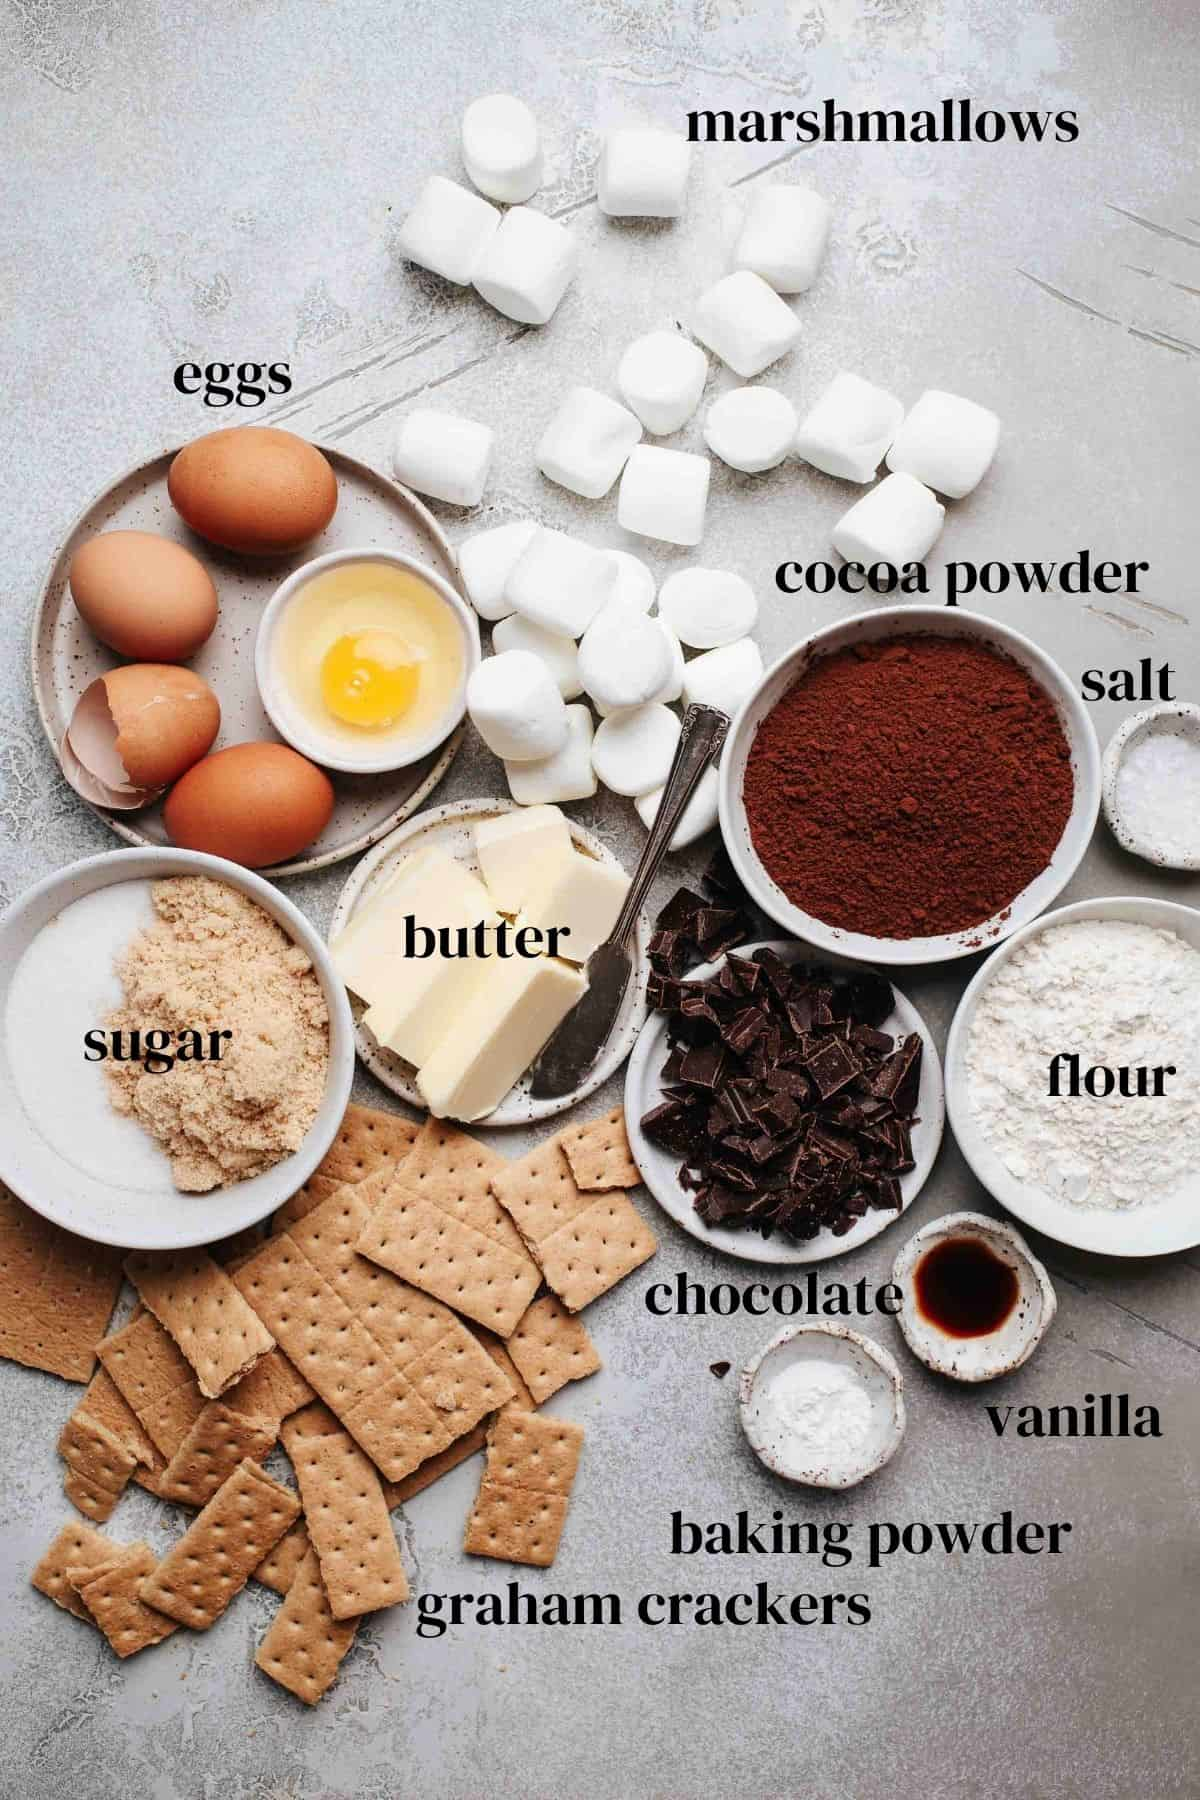 Marshmallows, eggs, sugar, butter, cocoa powder, salt, flout, chocolate, vanilla, graham crackers on a gray surface.